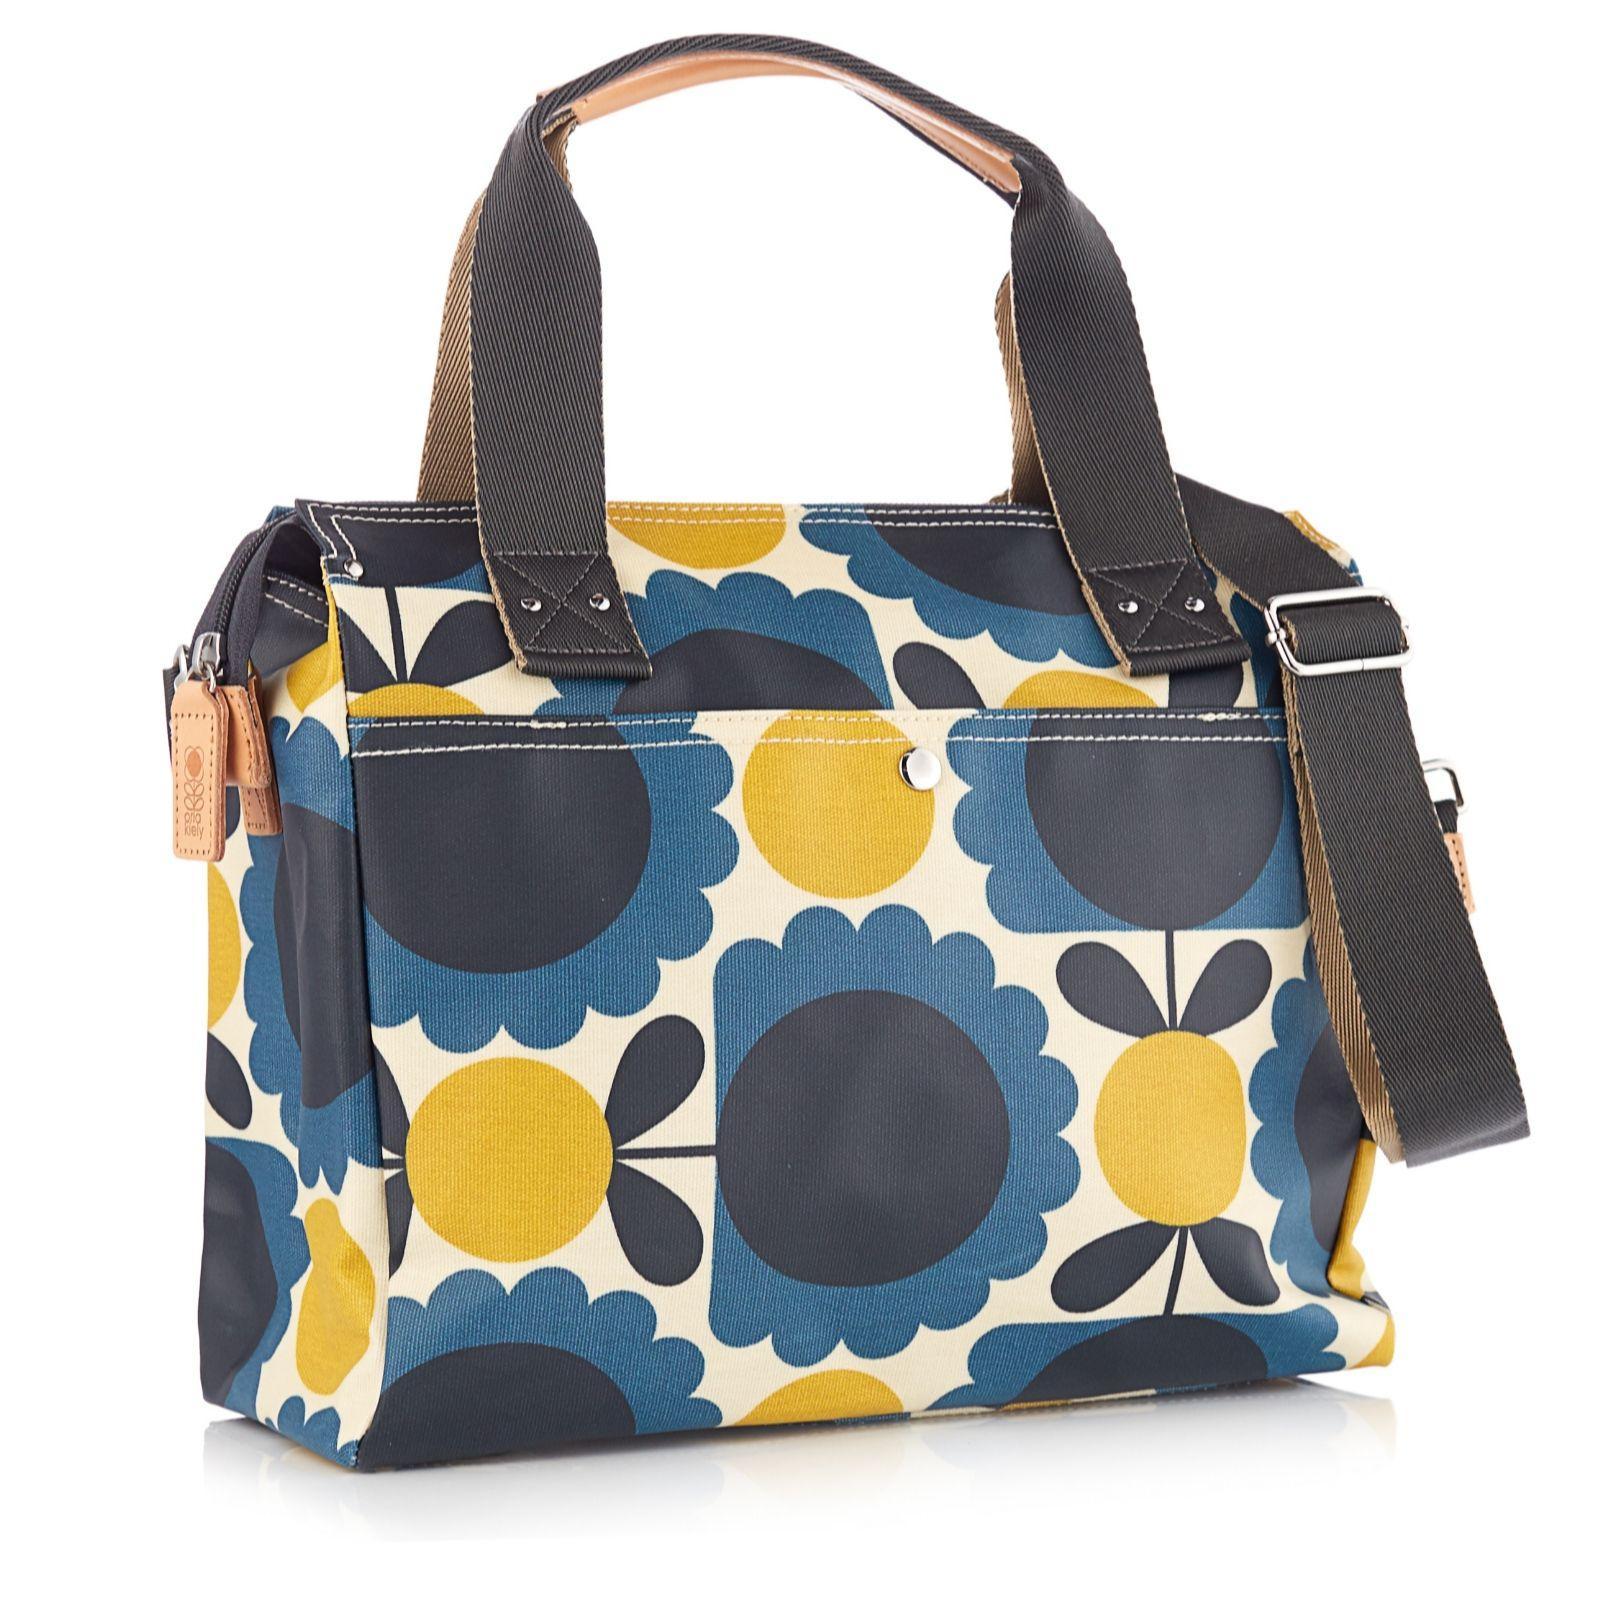 Orla Kiely Scallop Flower Spot Zip Messenger Bag Qvc Uk Clutch Black